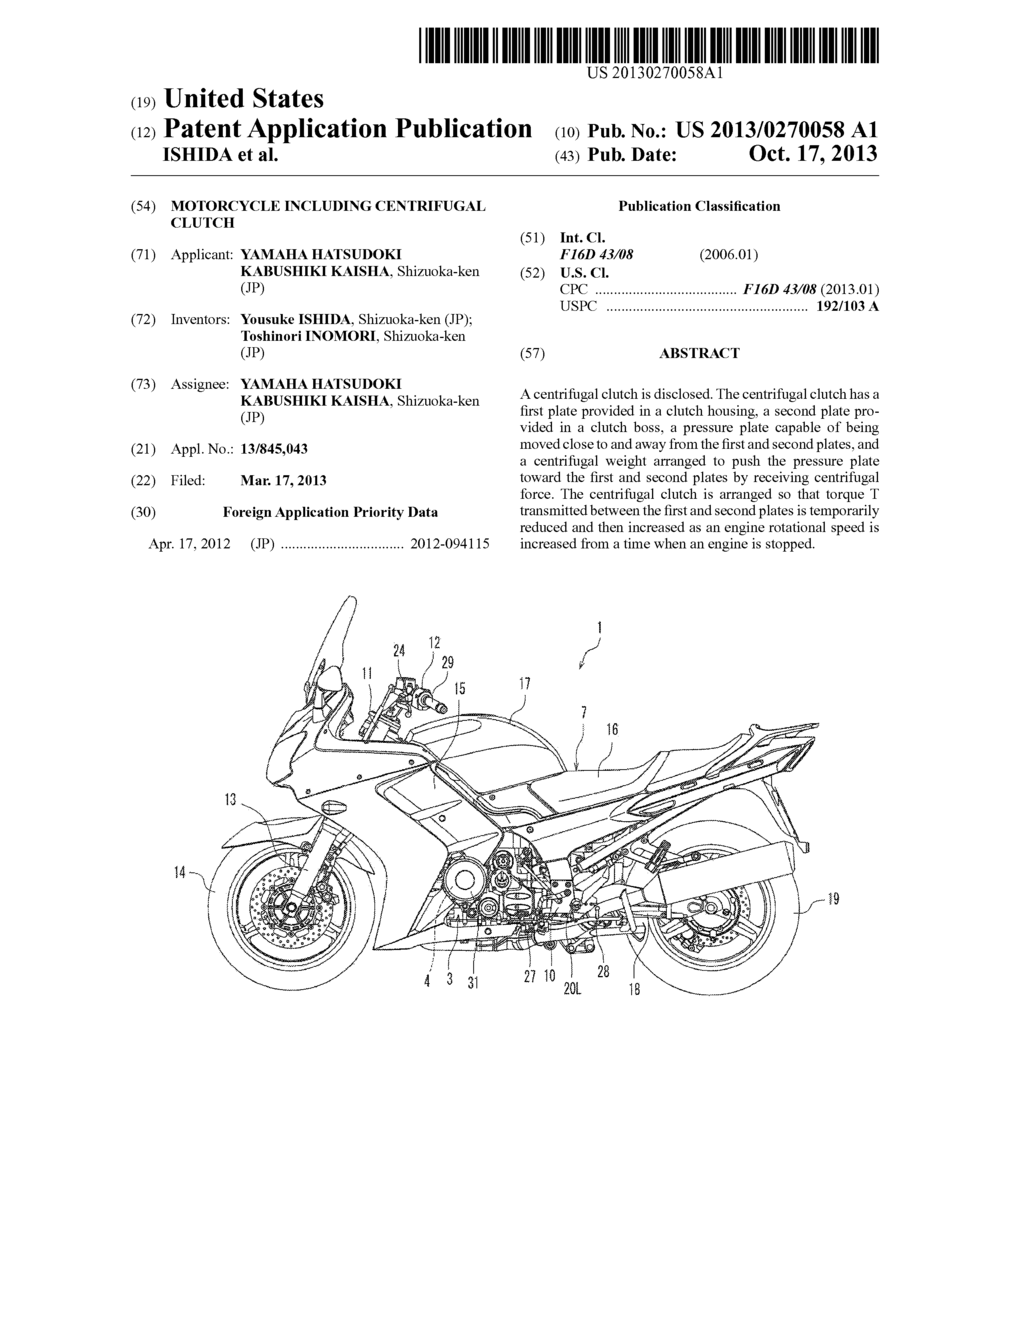 Diagram Motorcycle Engine Art Schematic Diagrams Clutch Wiring Firing Order